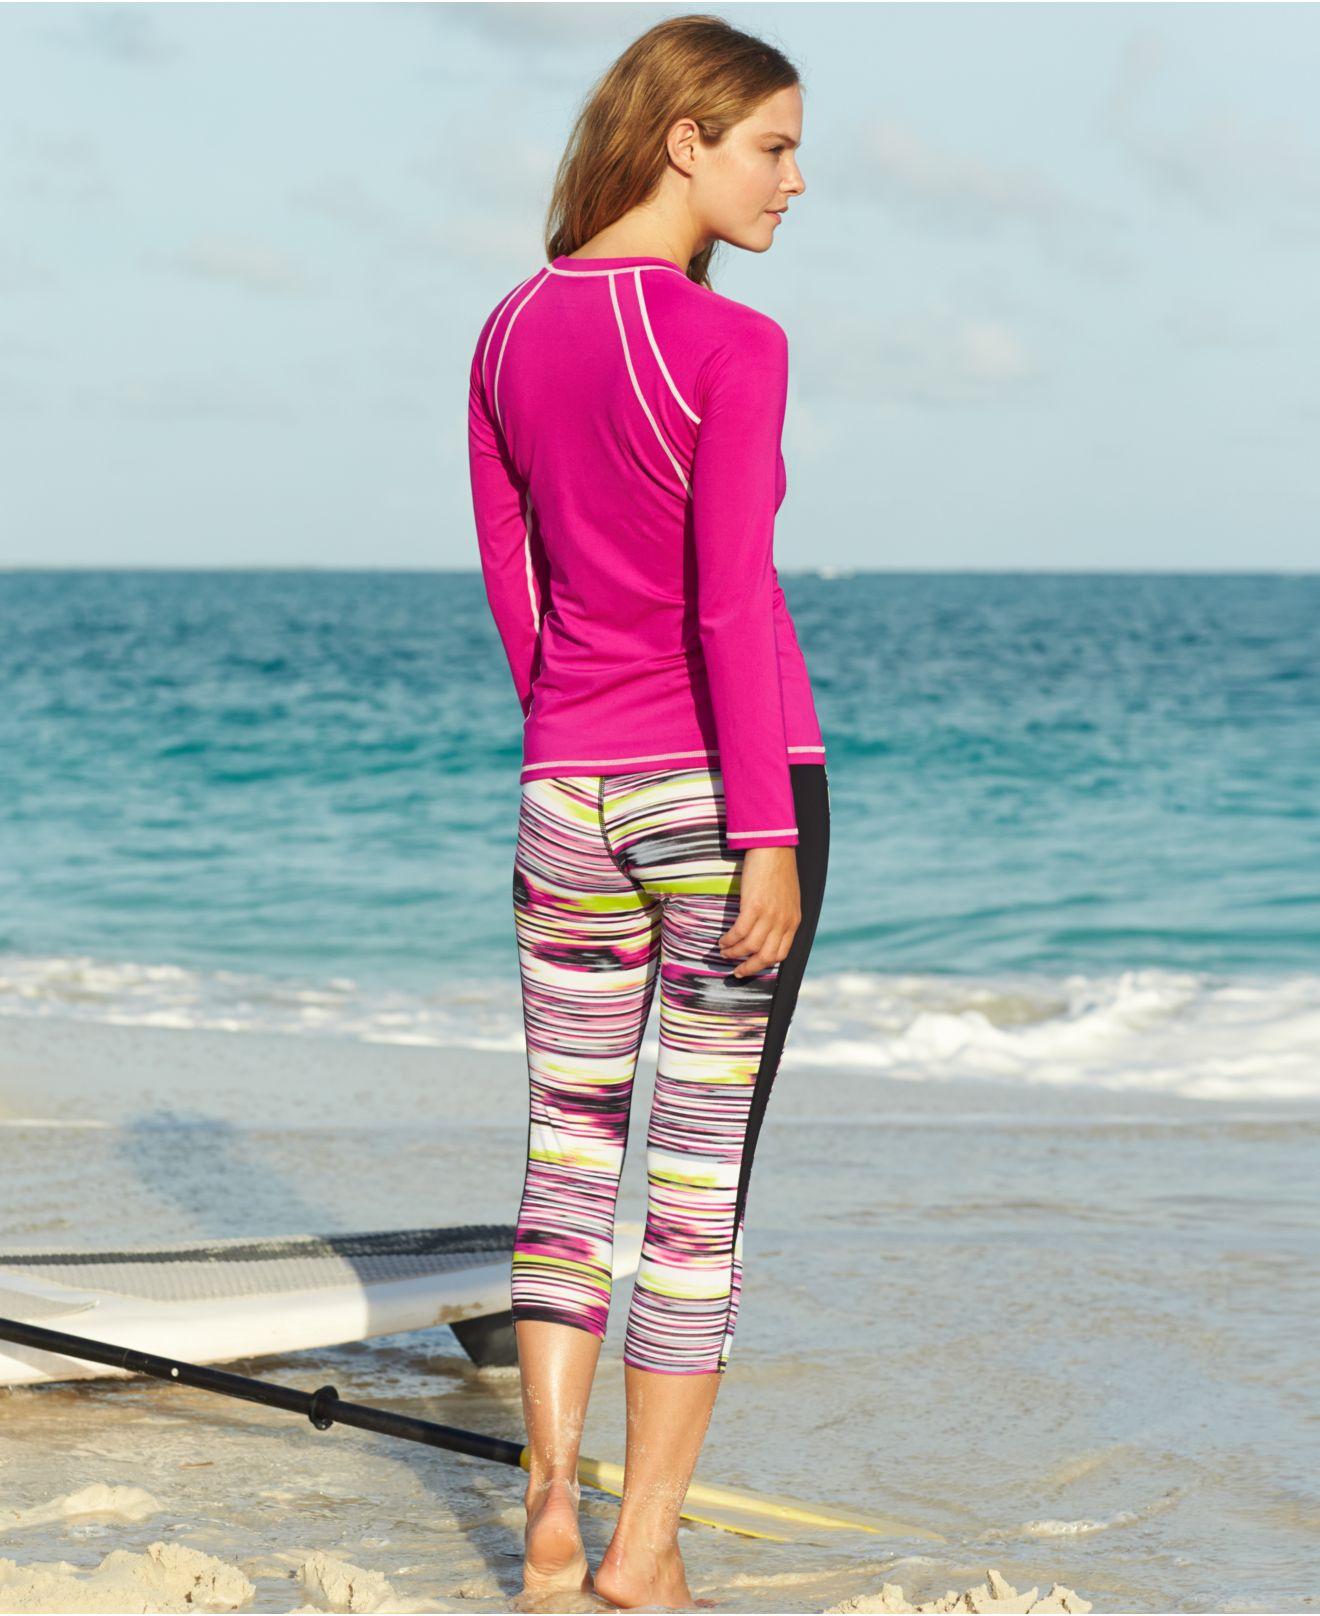 7b8ad174c1 Nike Long-sleeve Logo Rashguard in Pink - Lyst